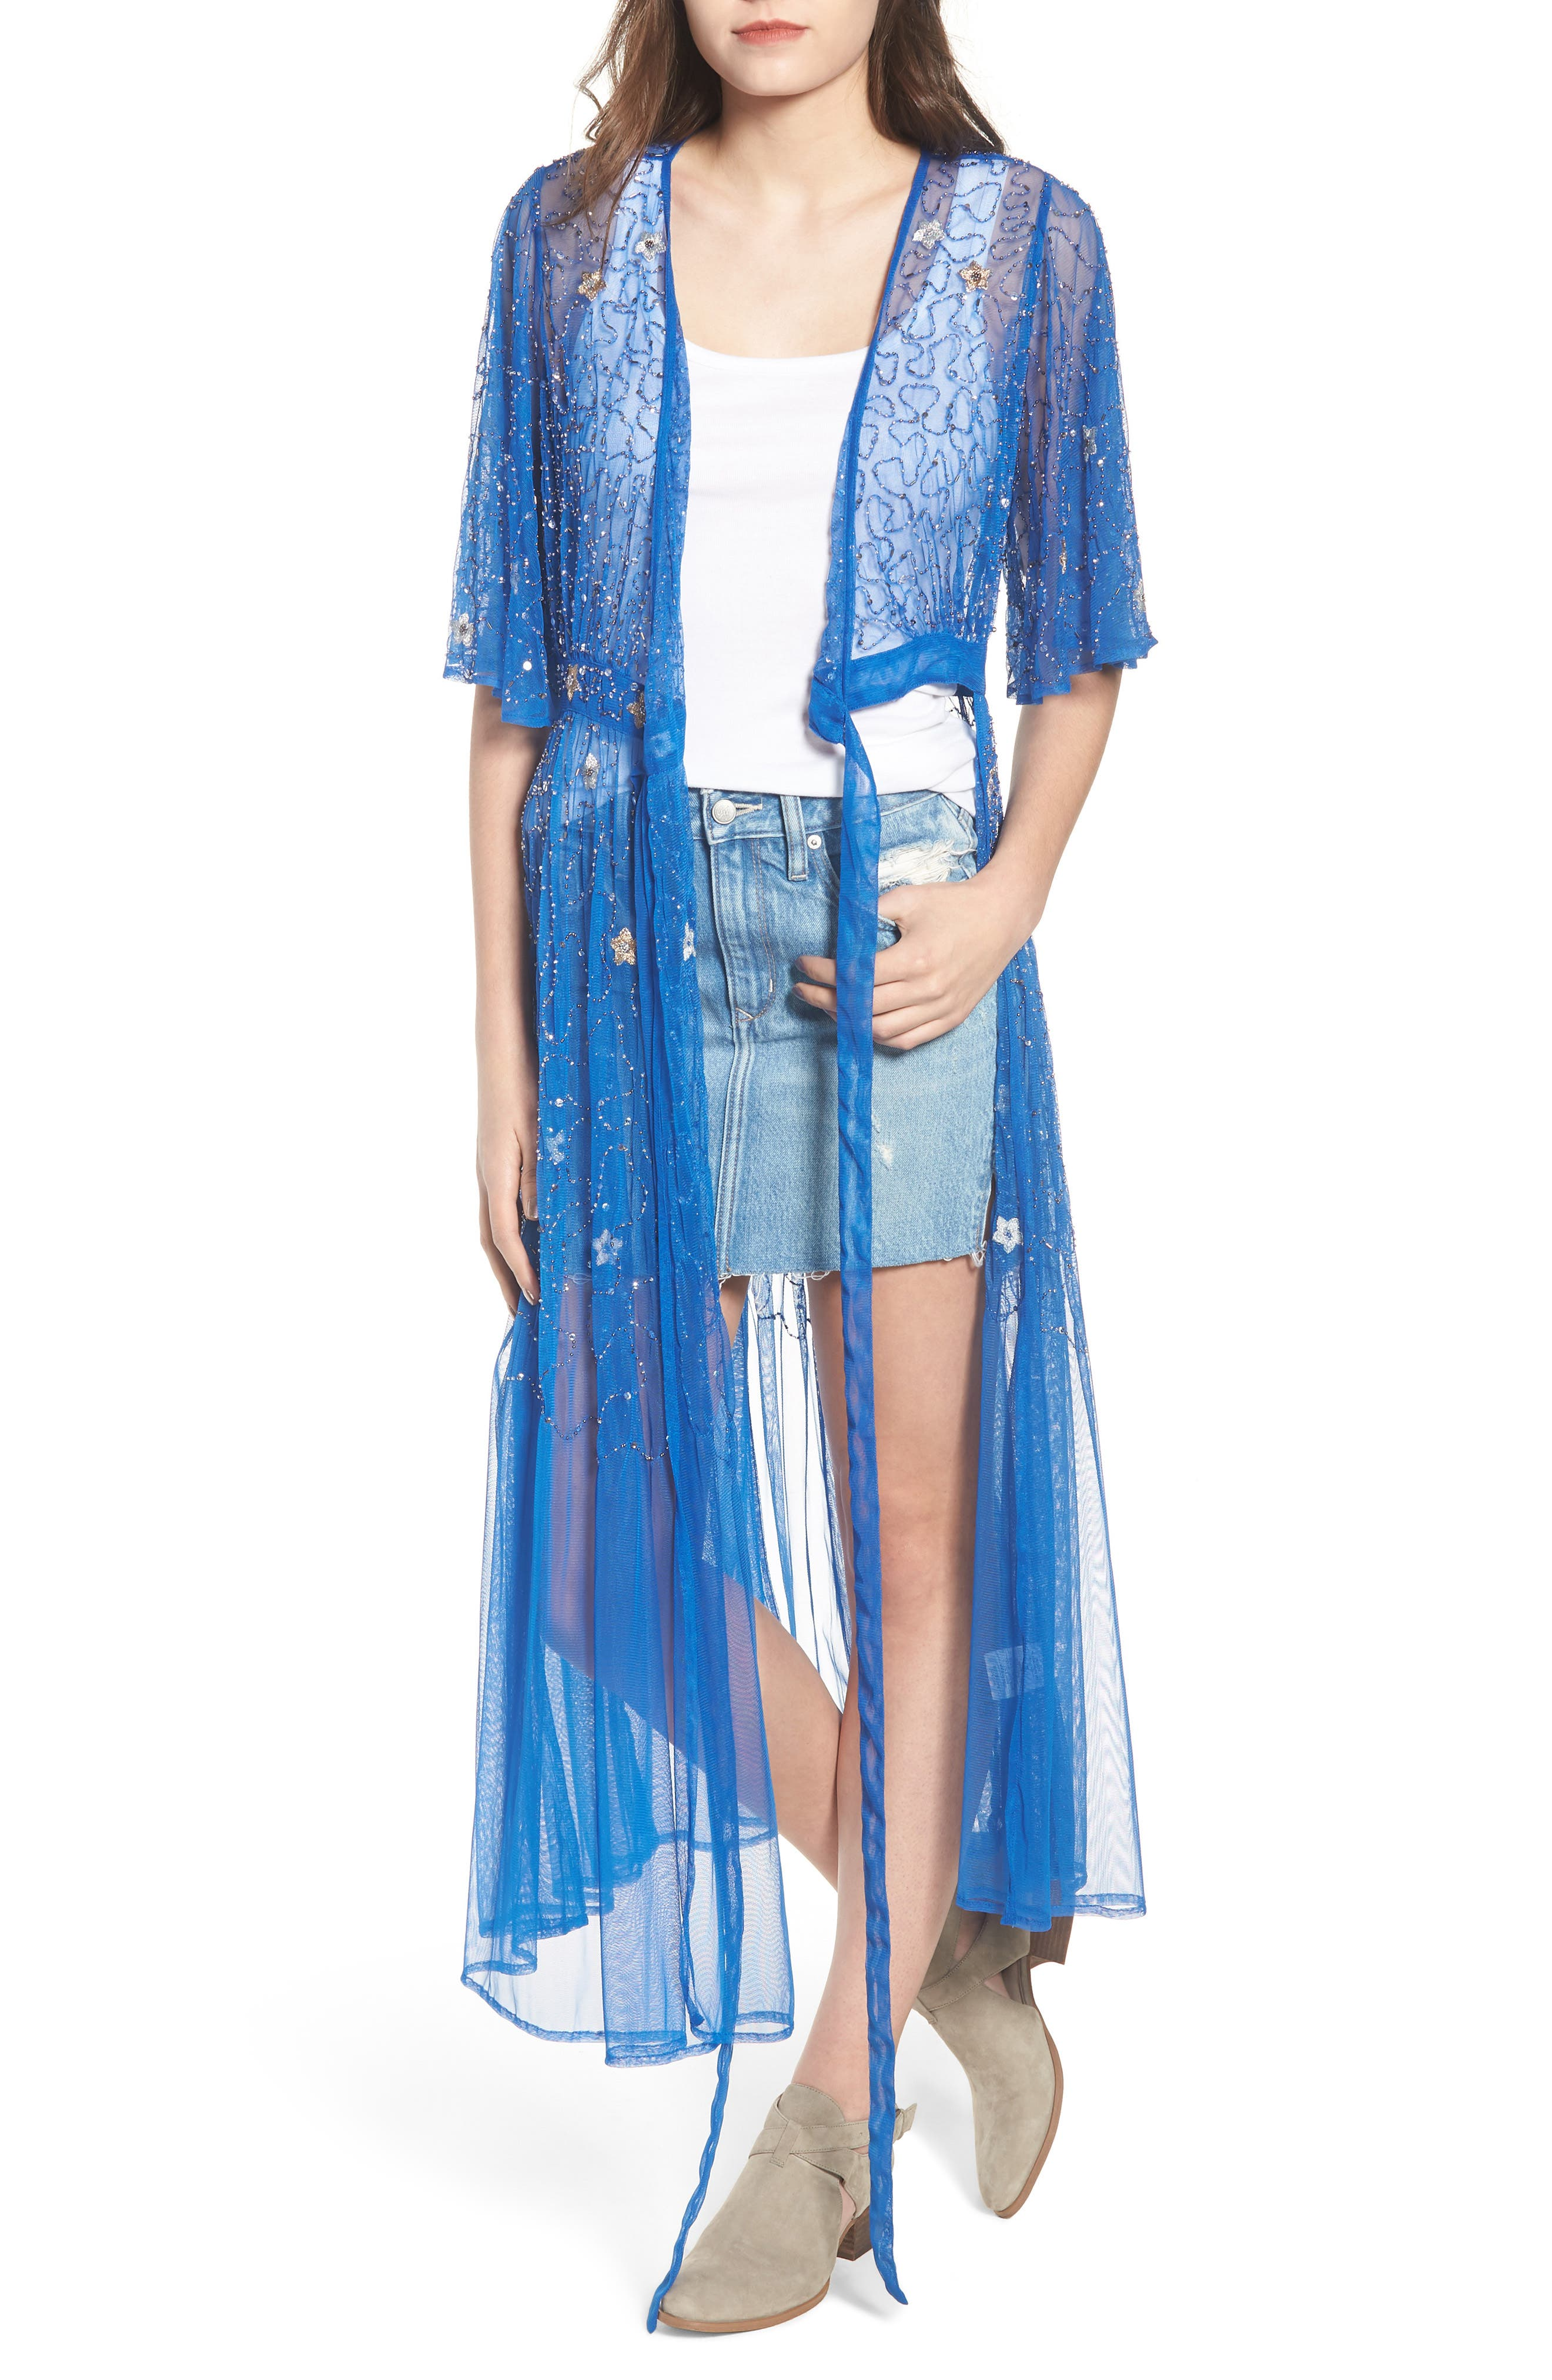 Stargazer Kimono,                             Main thumbnail 1, color,                             LAPIZ BLUE